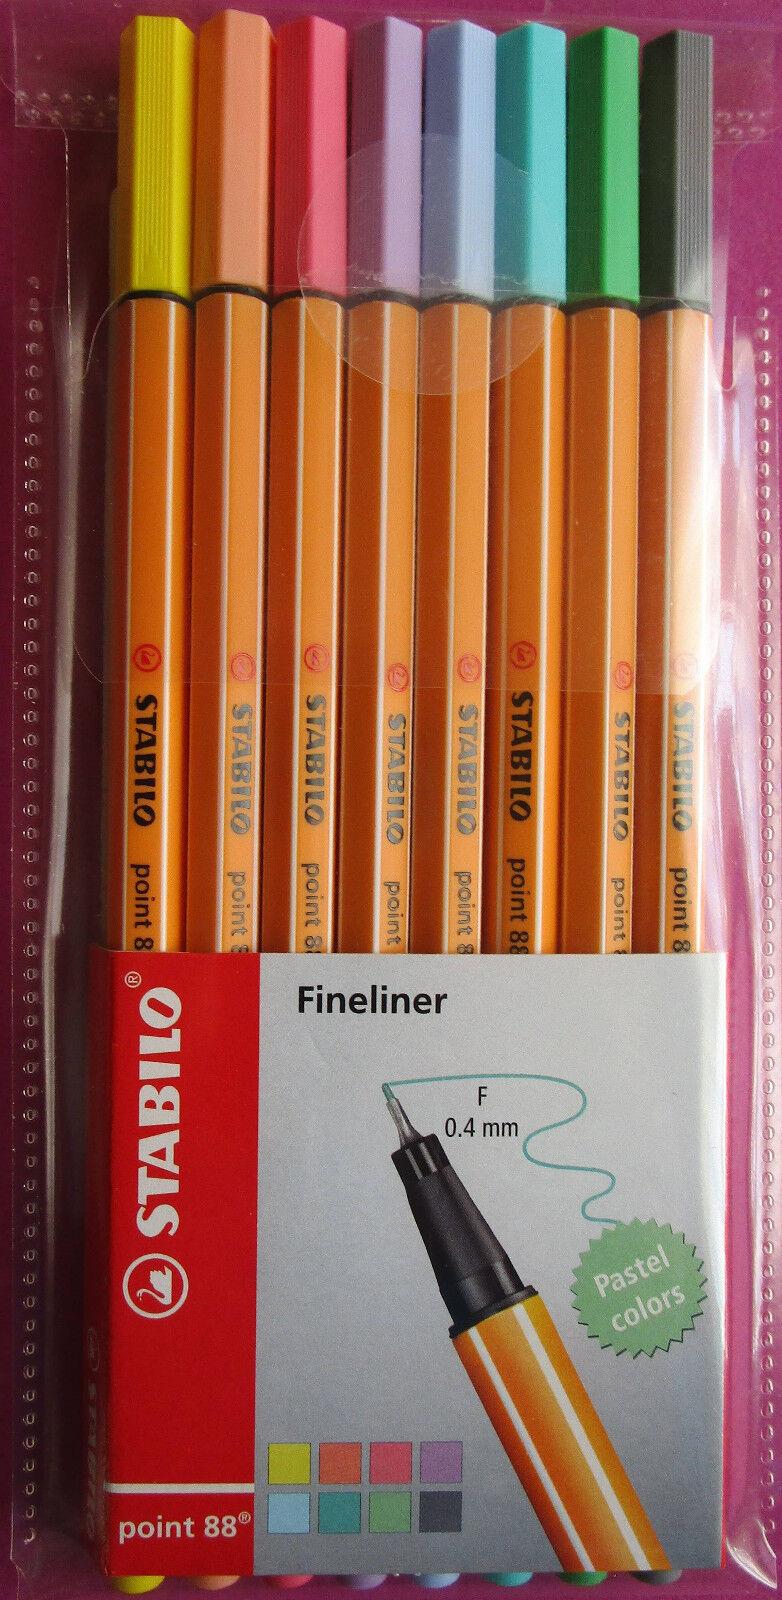 STABILO point 88 Fineliner 8er Etui Pastell Neu Tintenfeinschreiber